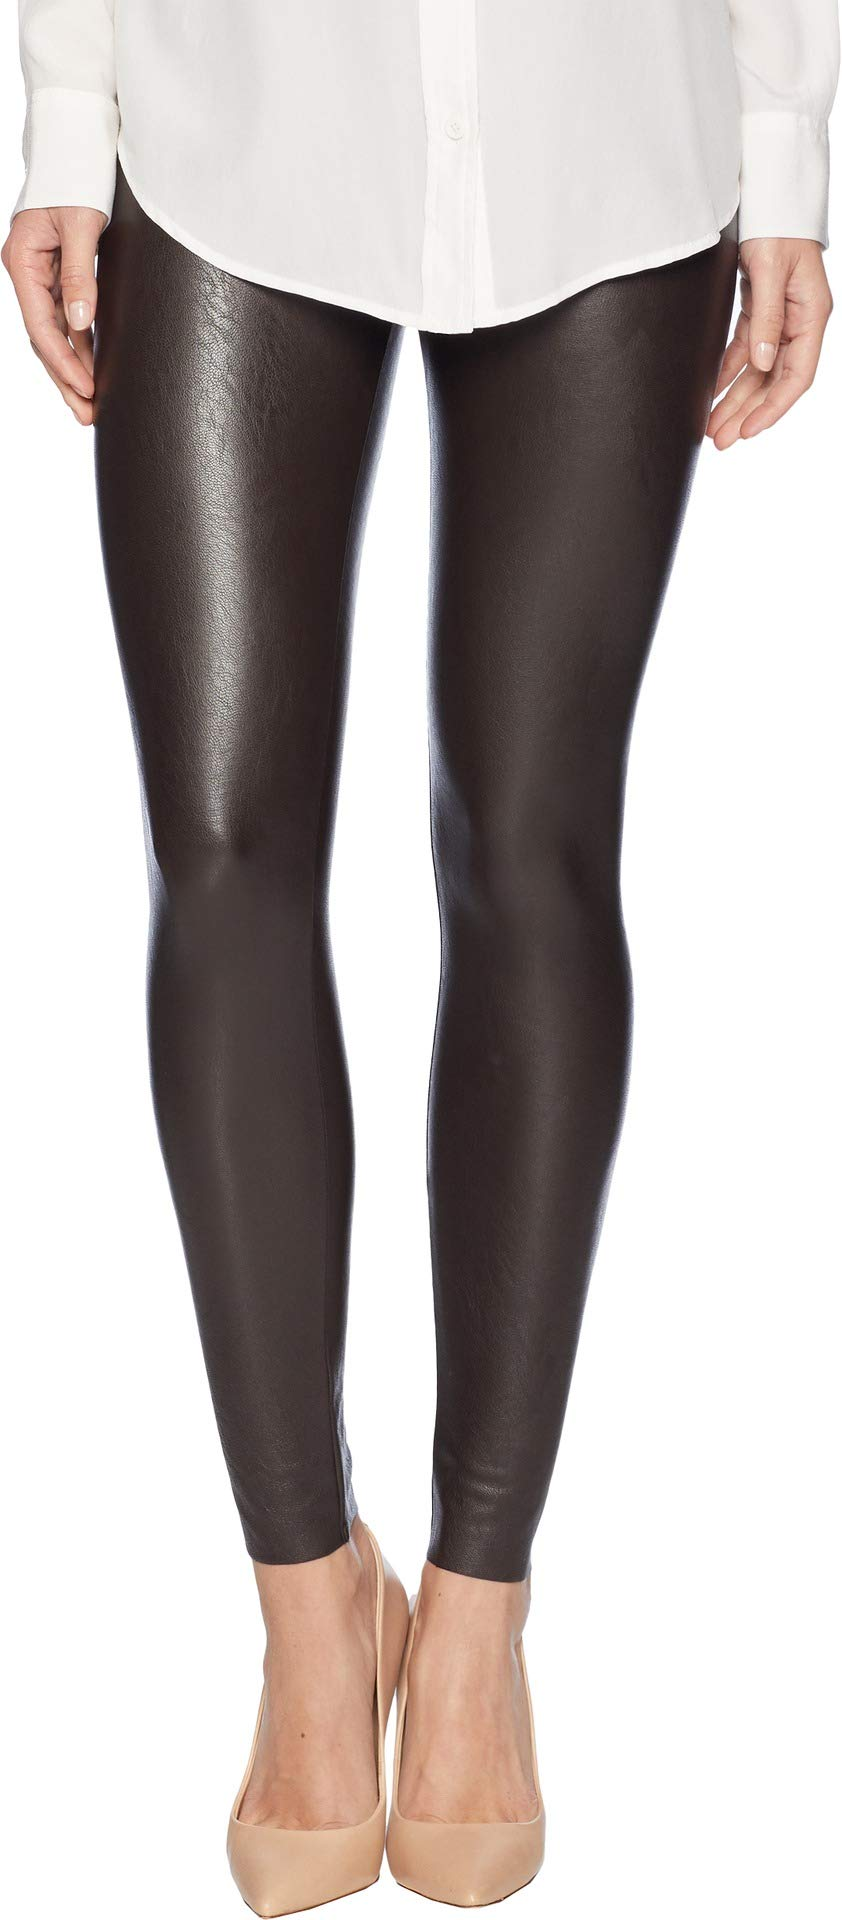 commando Women's Perfect Control Faux Leather Leggings SLG06 Espresso Large by commando (Image #1)